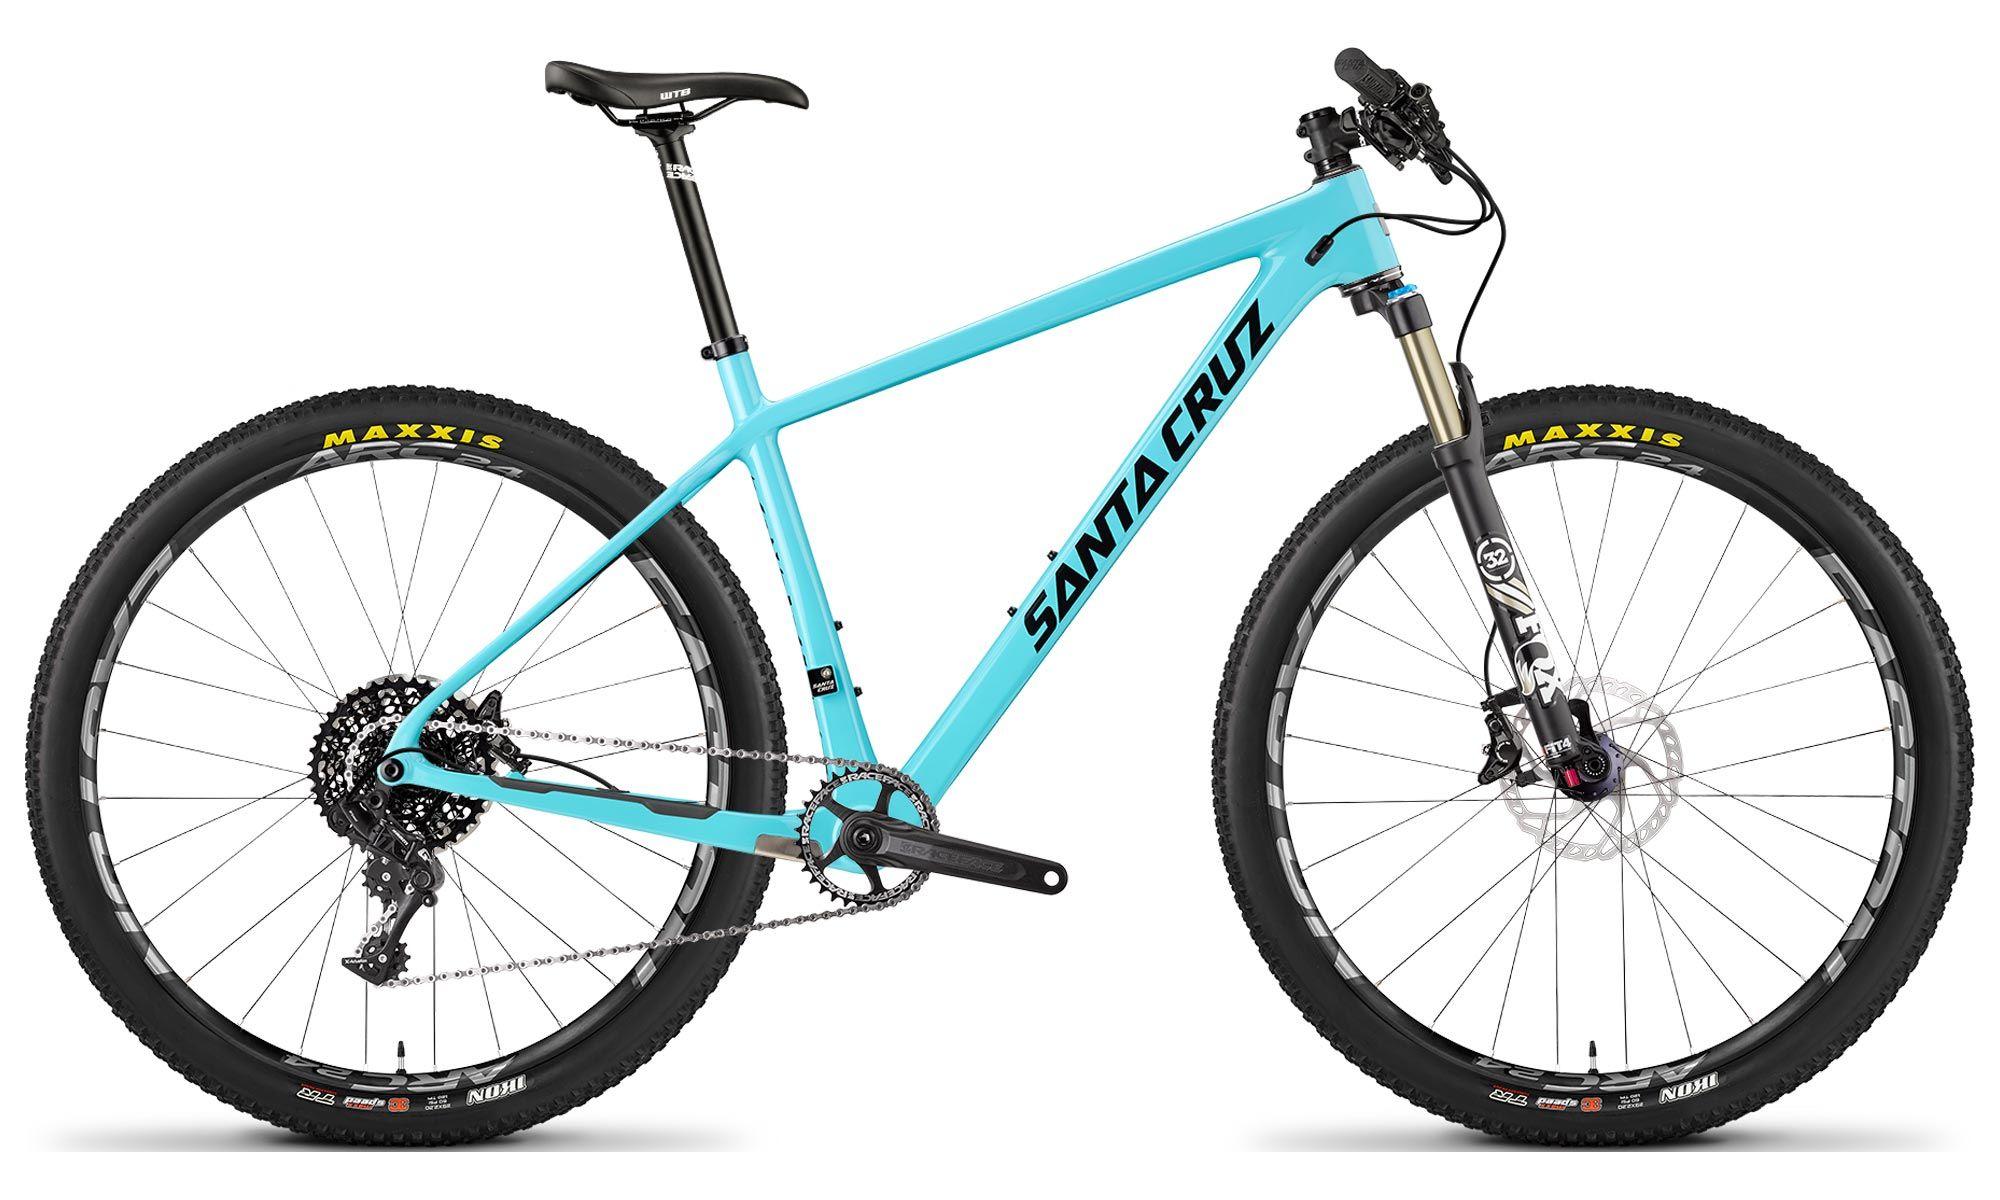 2016 Santa Cruz Highball 29 C S Carbon Hardtail Mountain Bike